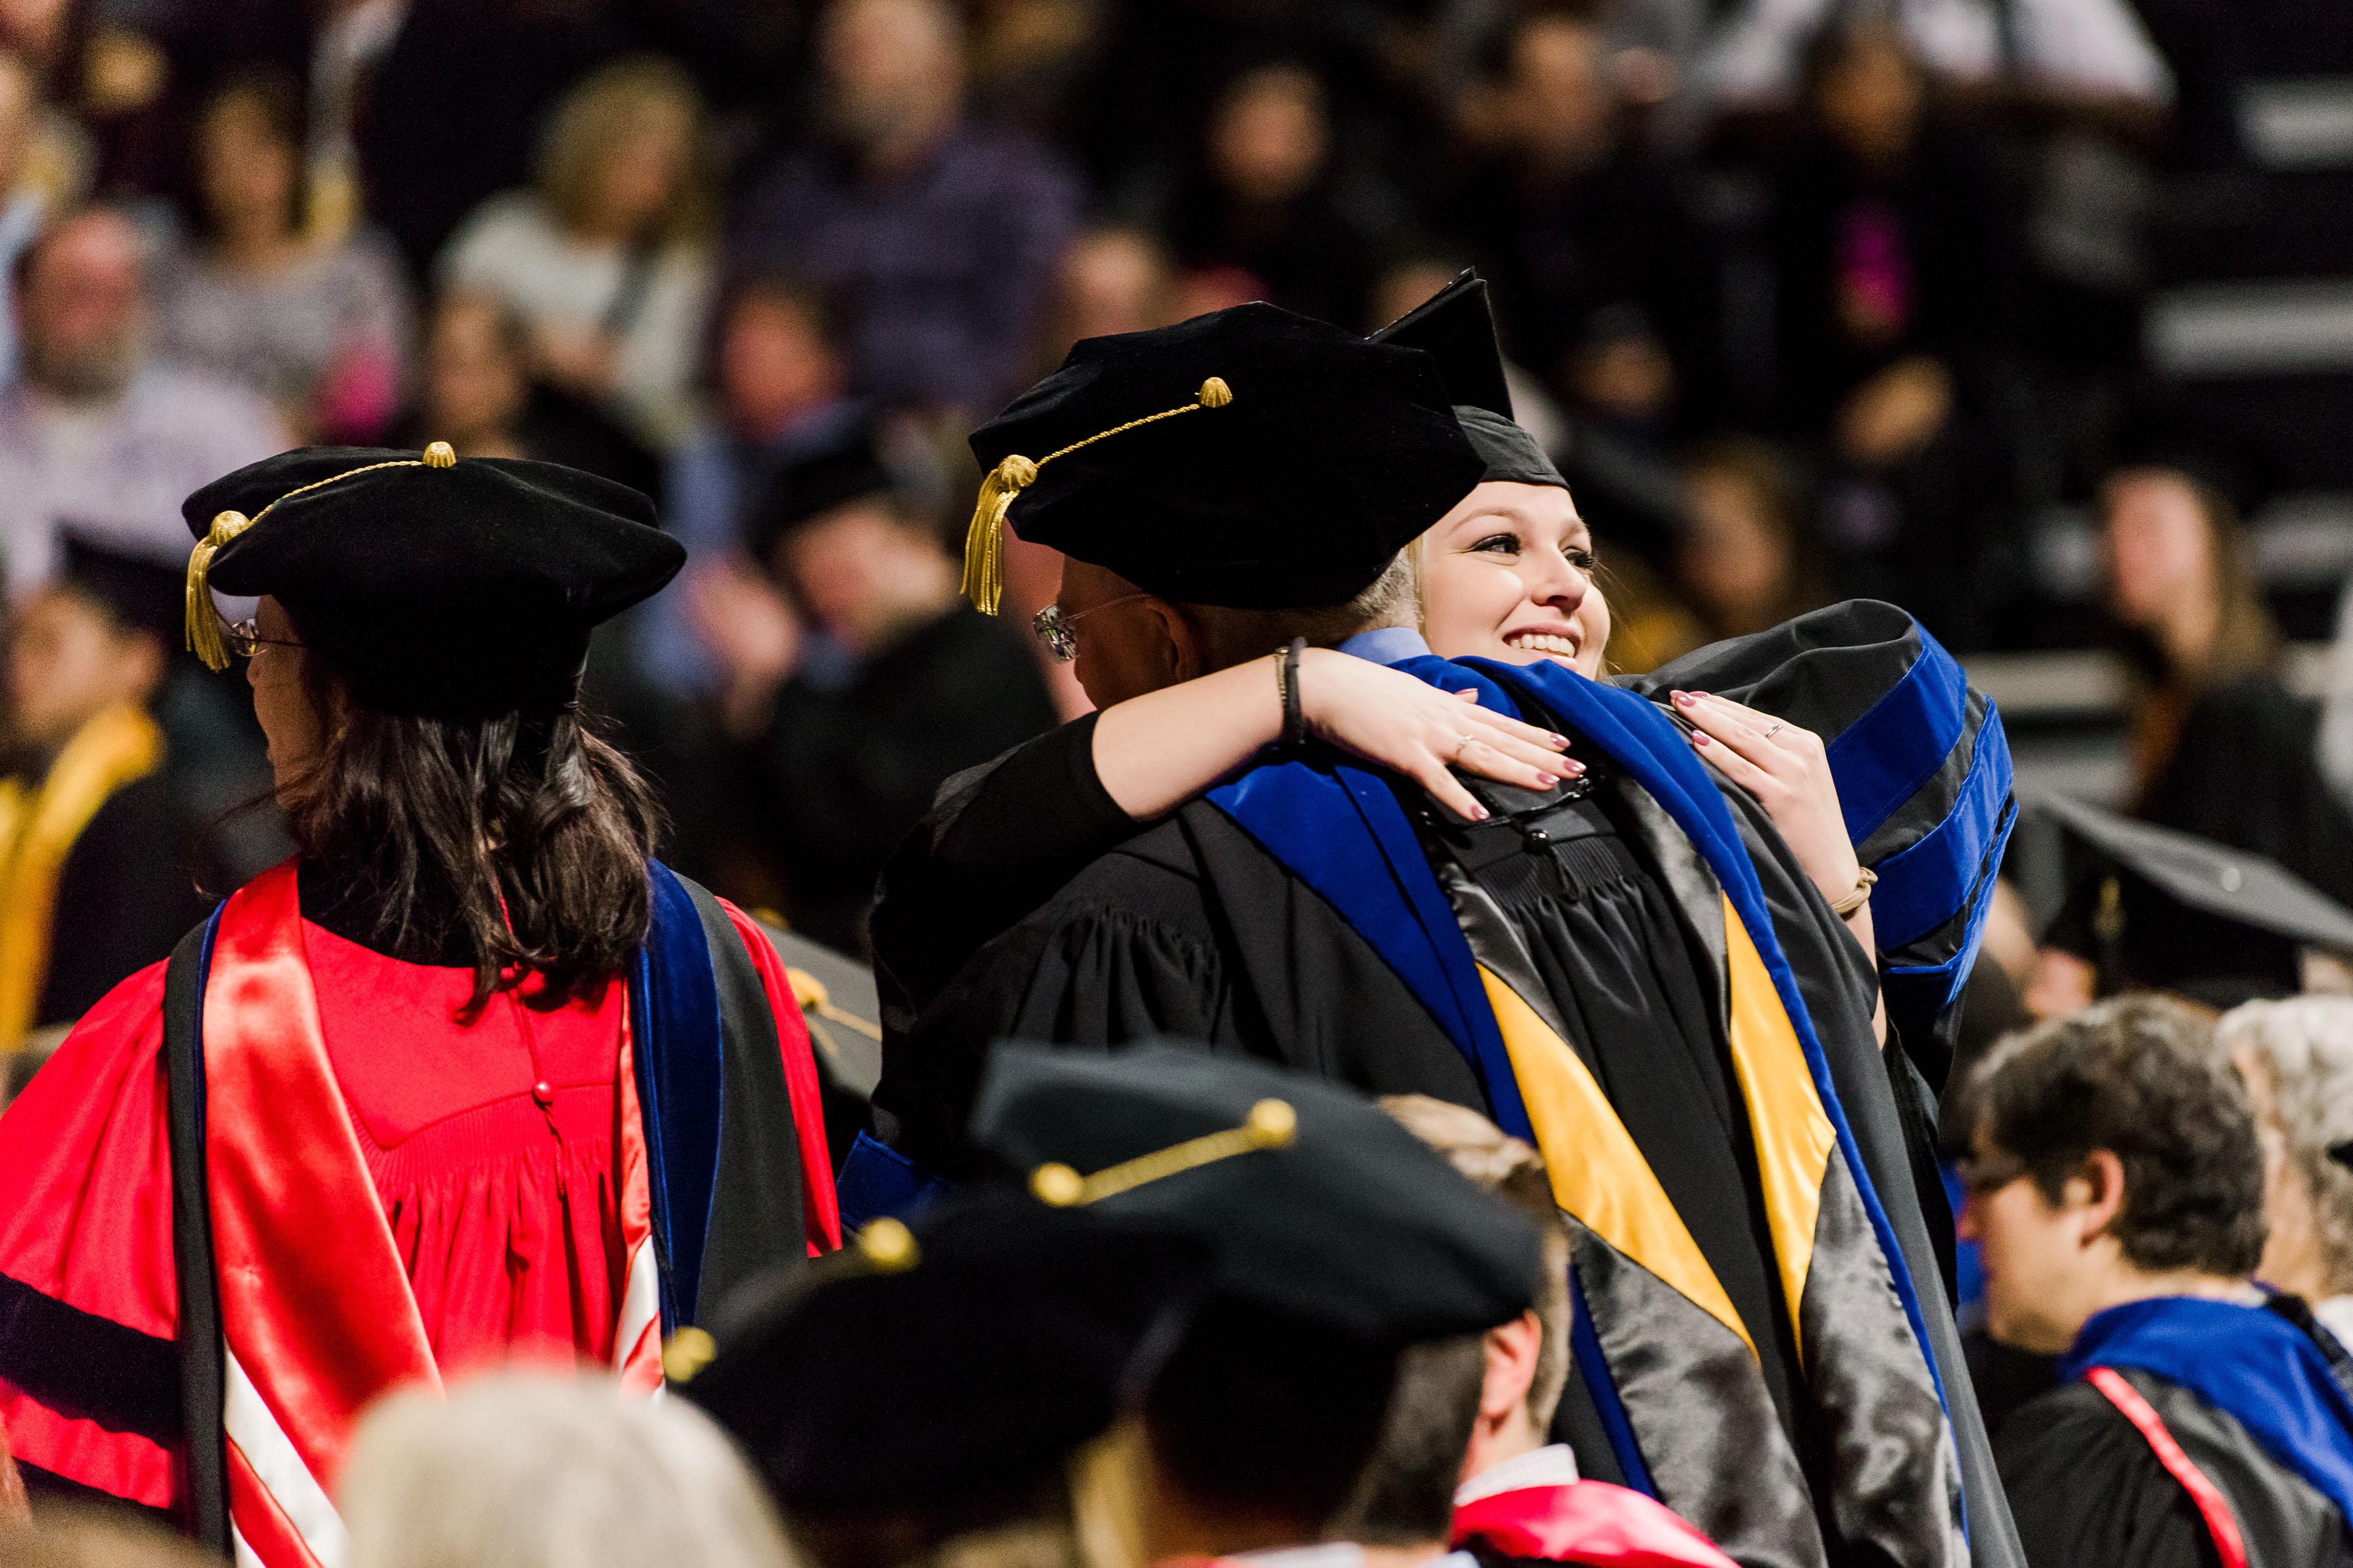 Two people in graduation garbs hugging